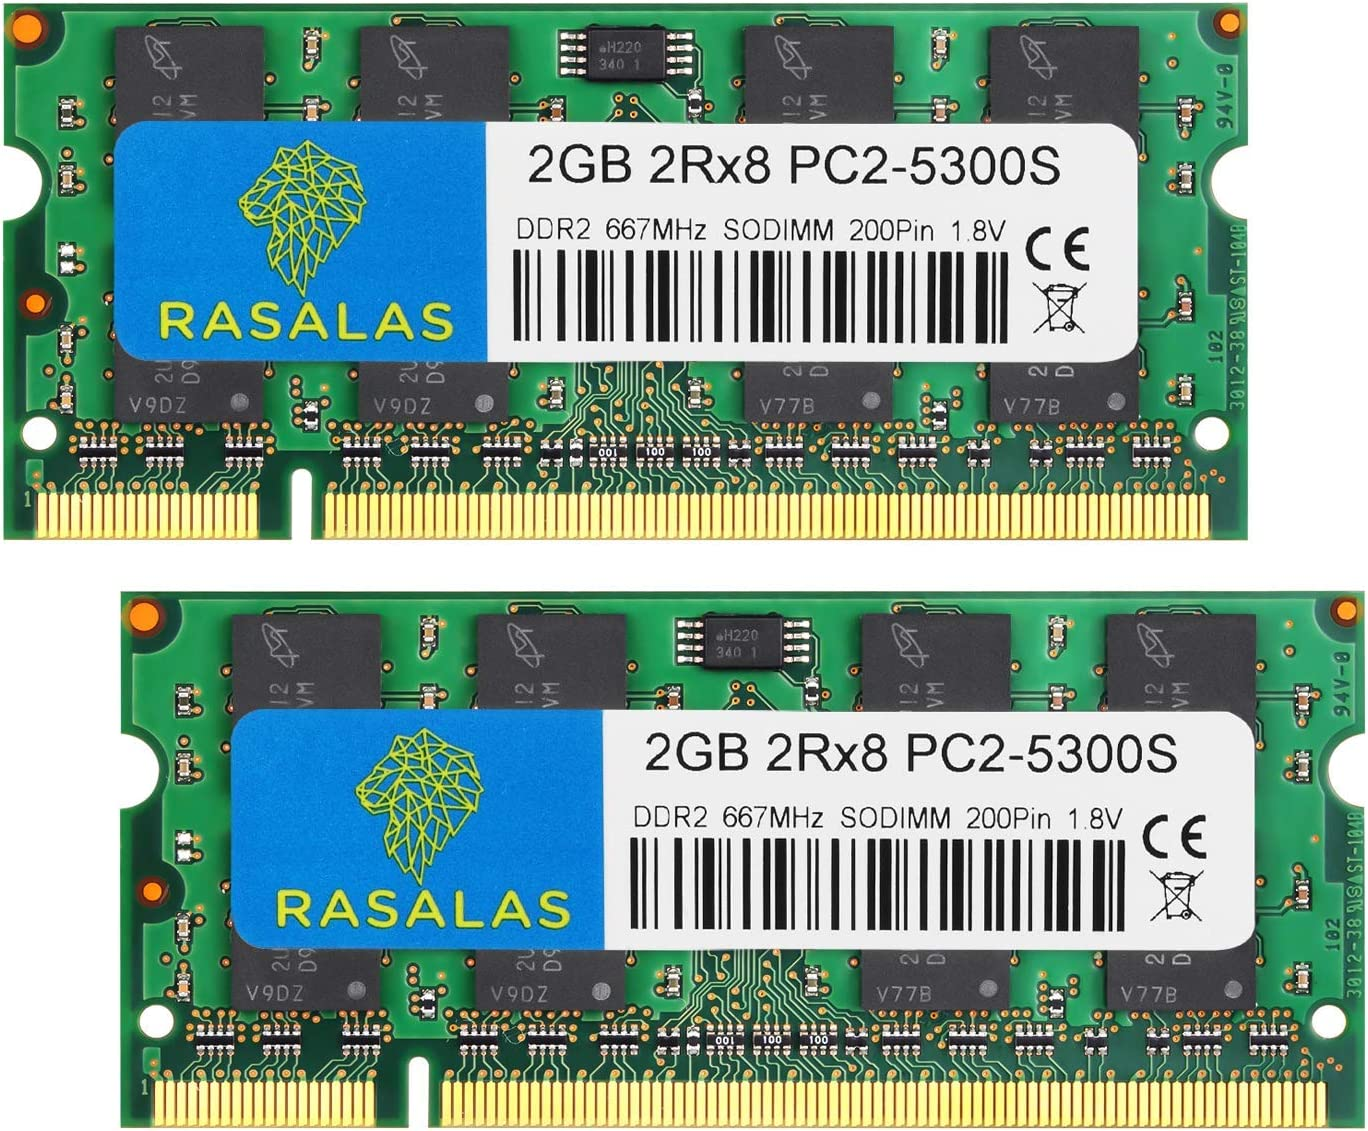 Rasalas PC2-5300 DDR2 667 DDR2 4GB Kit (2x2GB) DDR2 PC2-5300 DDR2 Sodimm PC2-5300S 1.8V CL5 RAM Memory Modules for Intel, MAC, AMD System Notebook Laptop